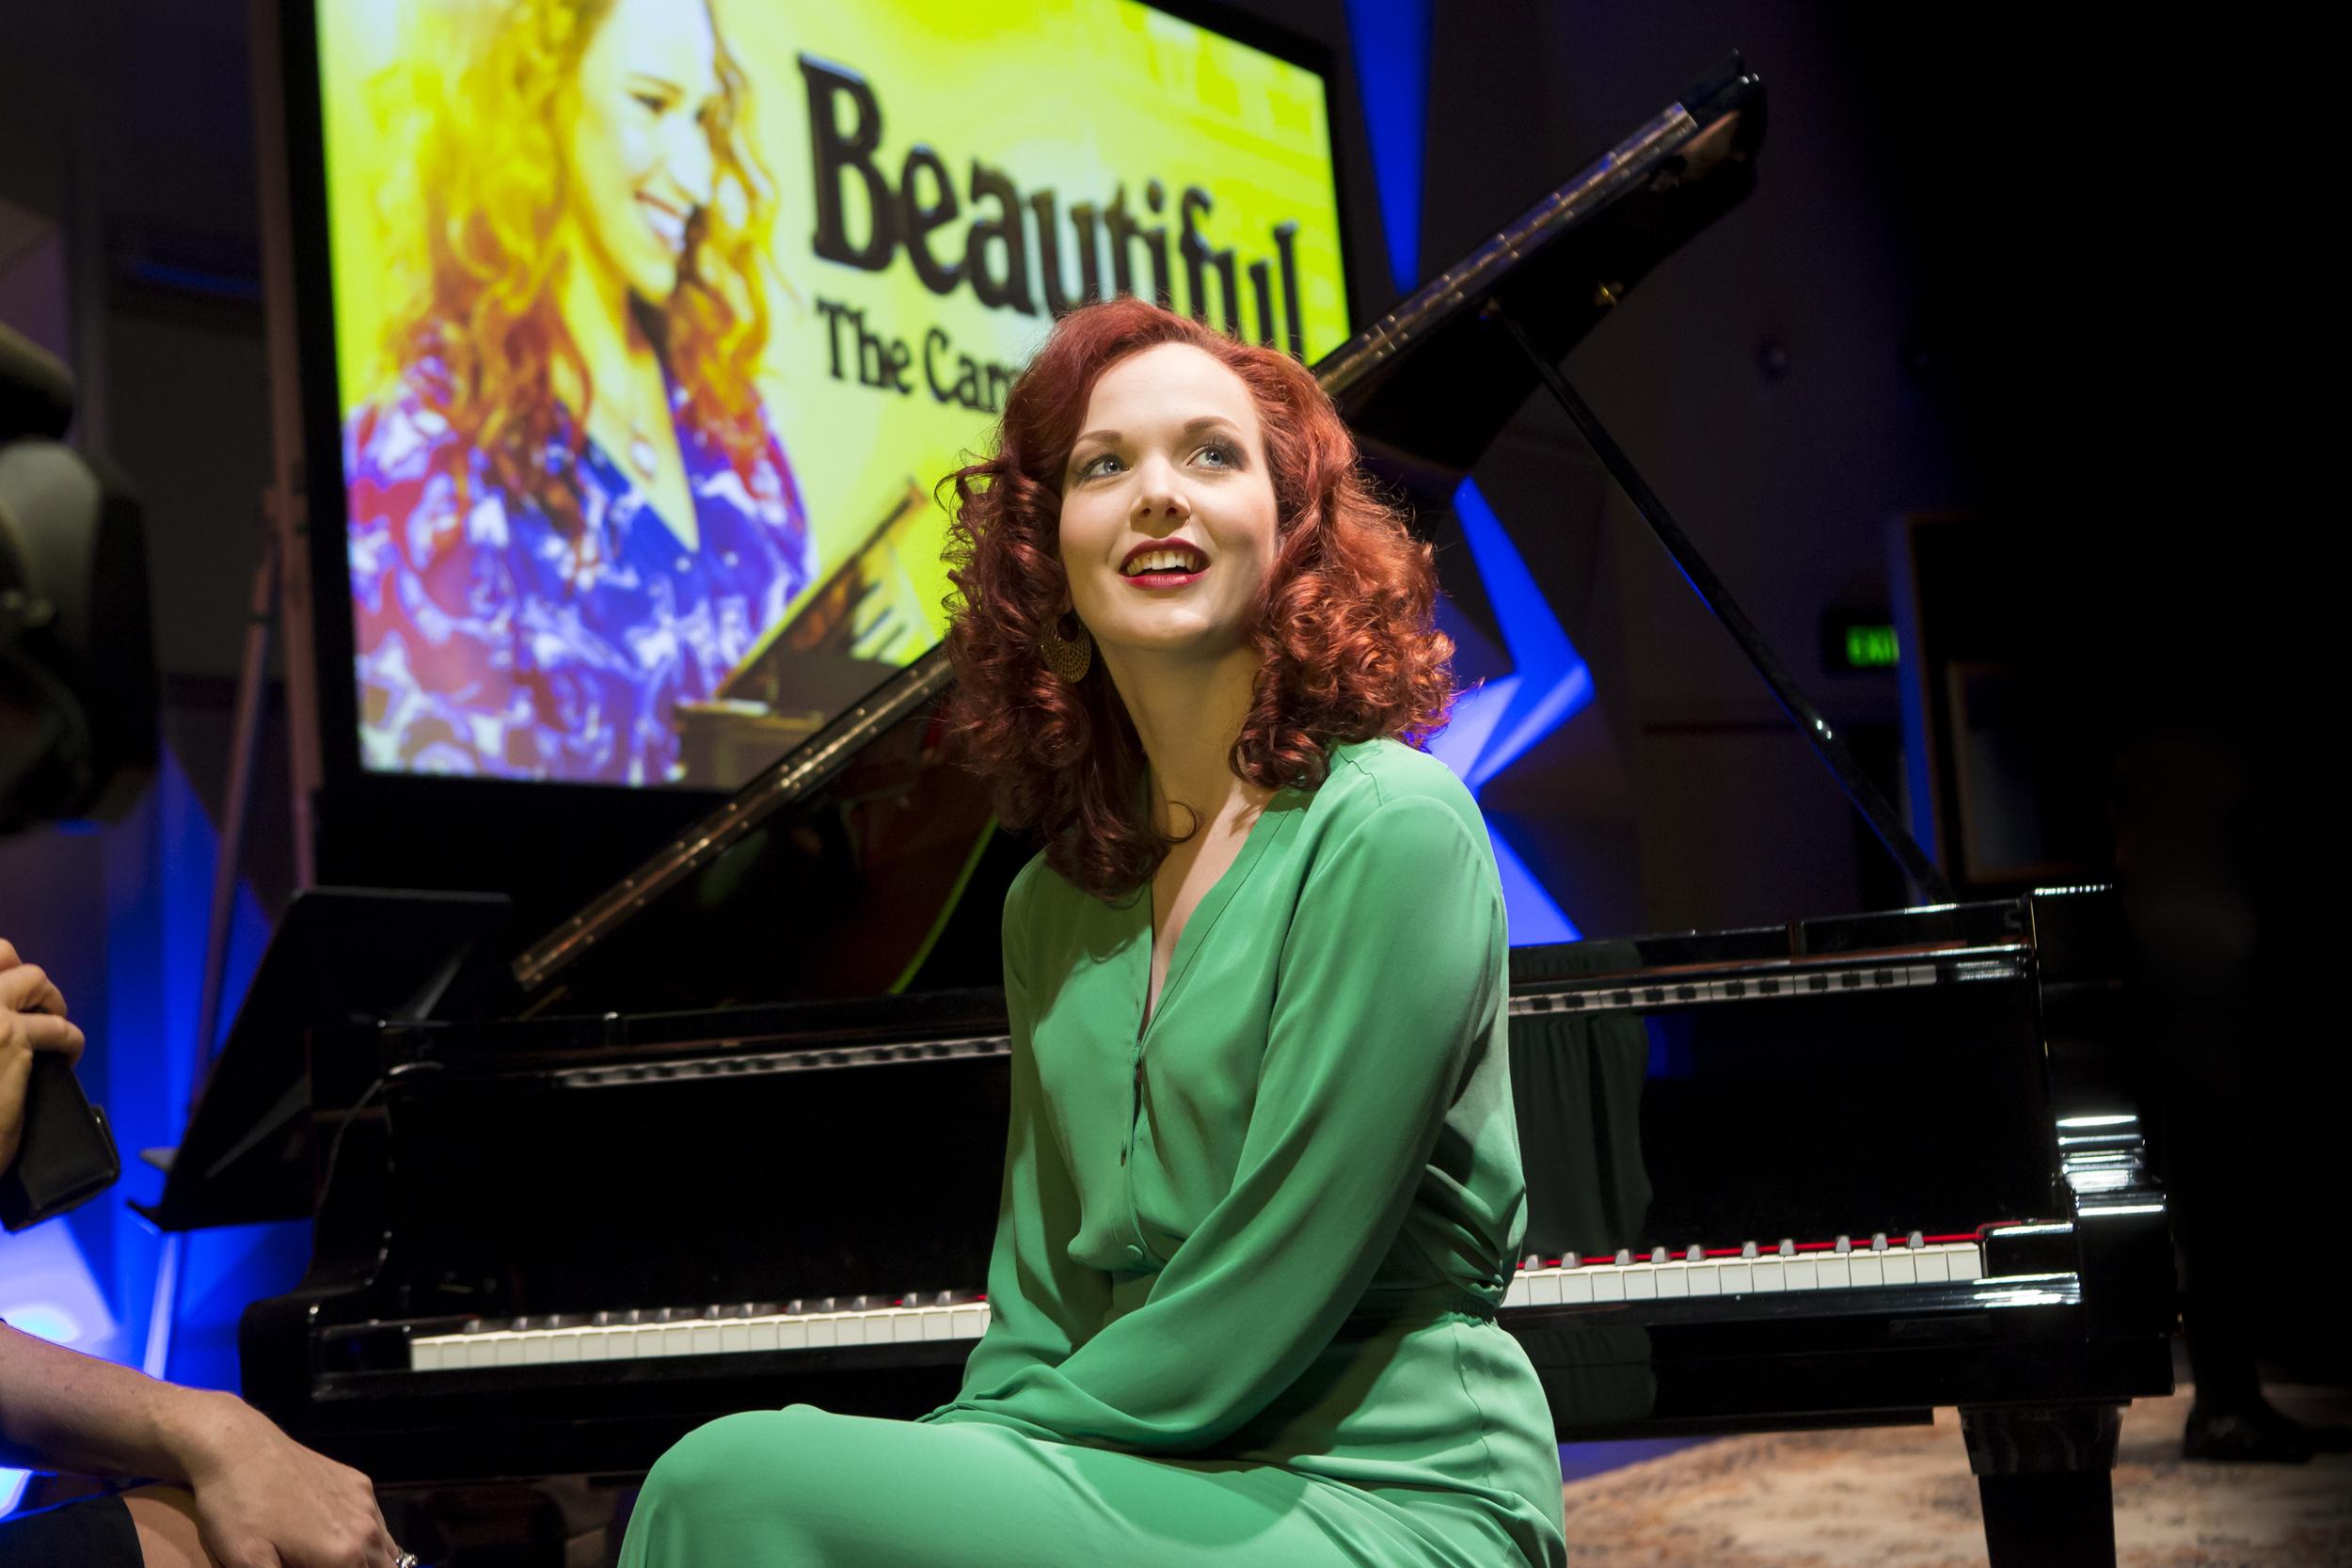 Rebecca LaChanceBeautiful- The Carole King Musical Announcement-HIRES-18.jpg